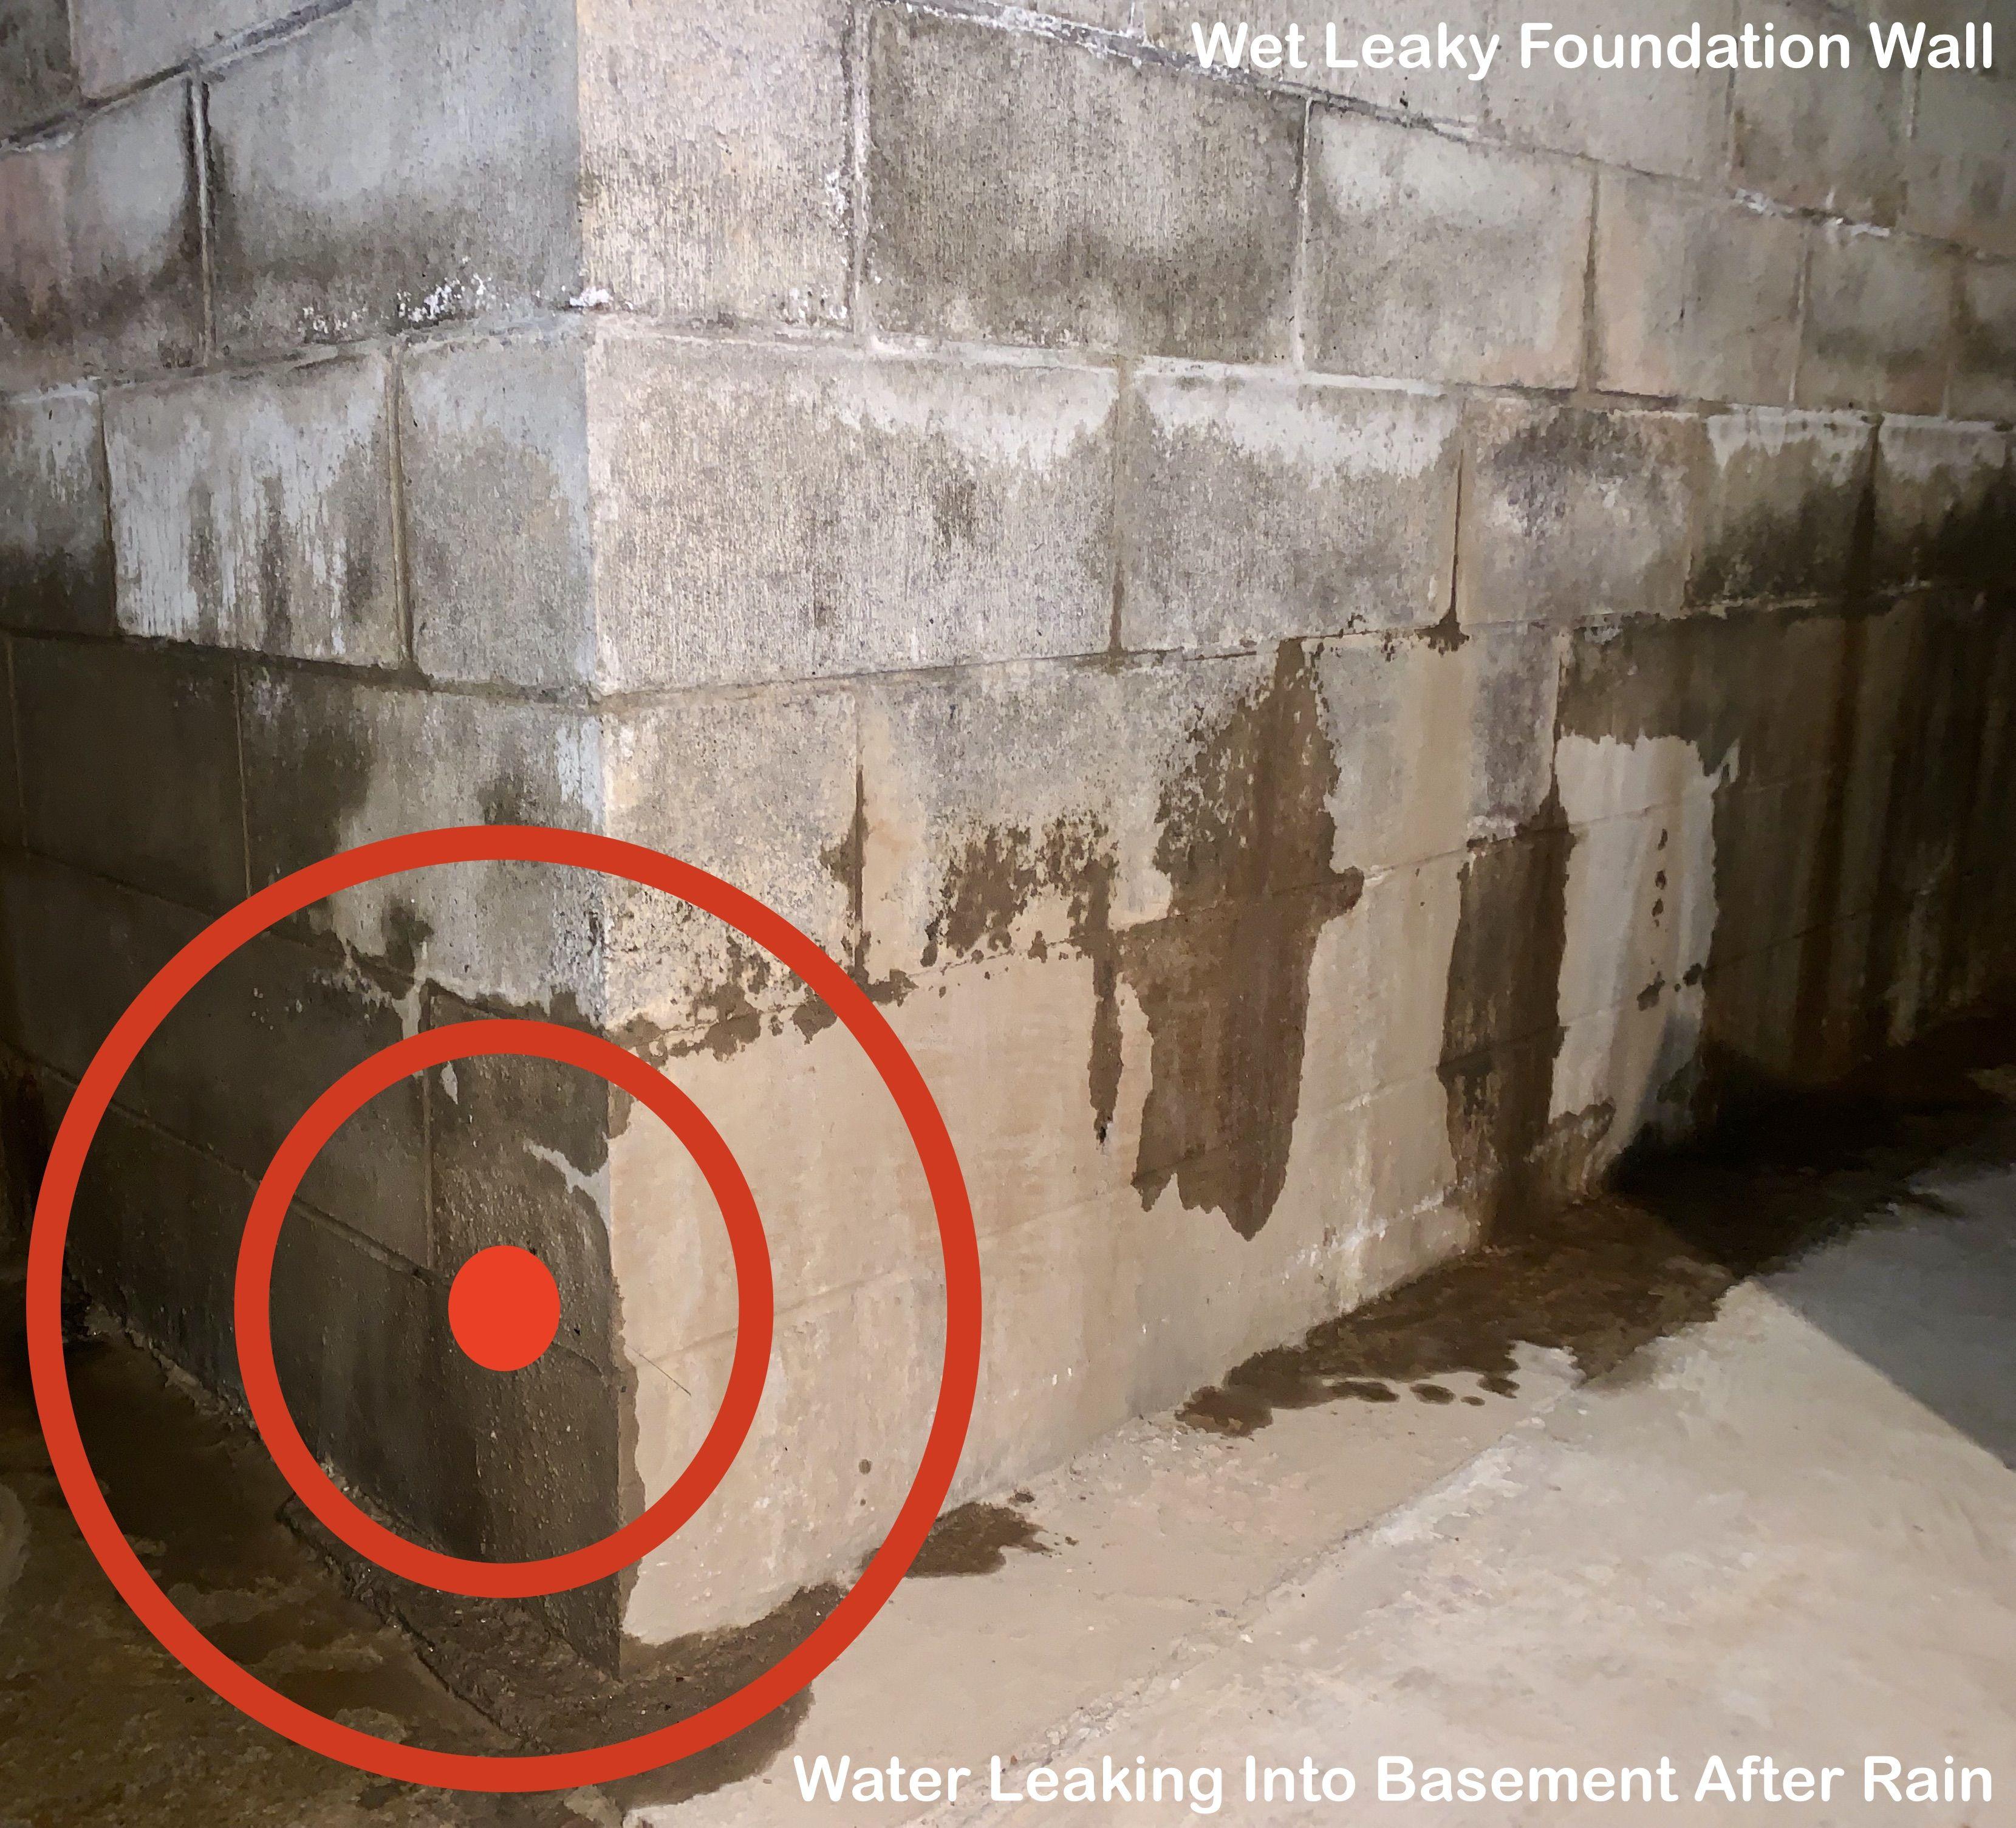 Basement Foundation Walls Leaking Water Onto Floor After Rain Wet Basement Waterproofing Problem In 2020 Waterproofing Basement Wet Basement Leaking Basement